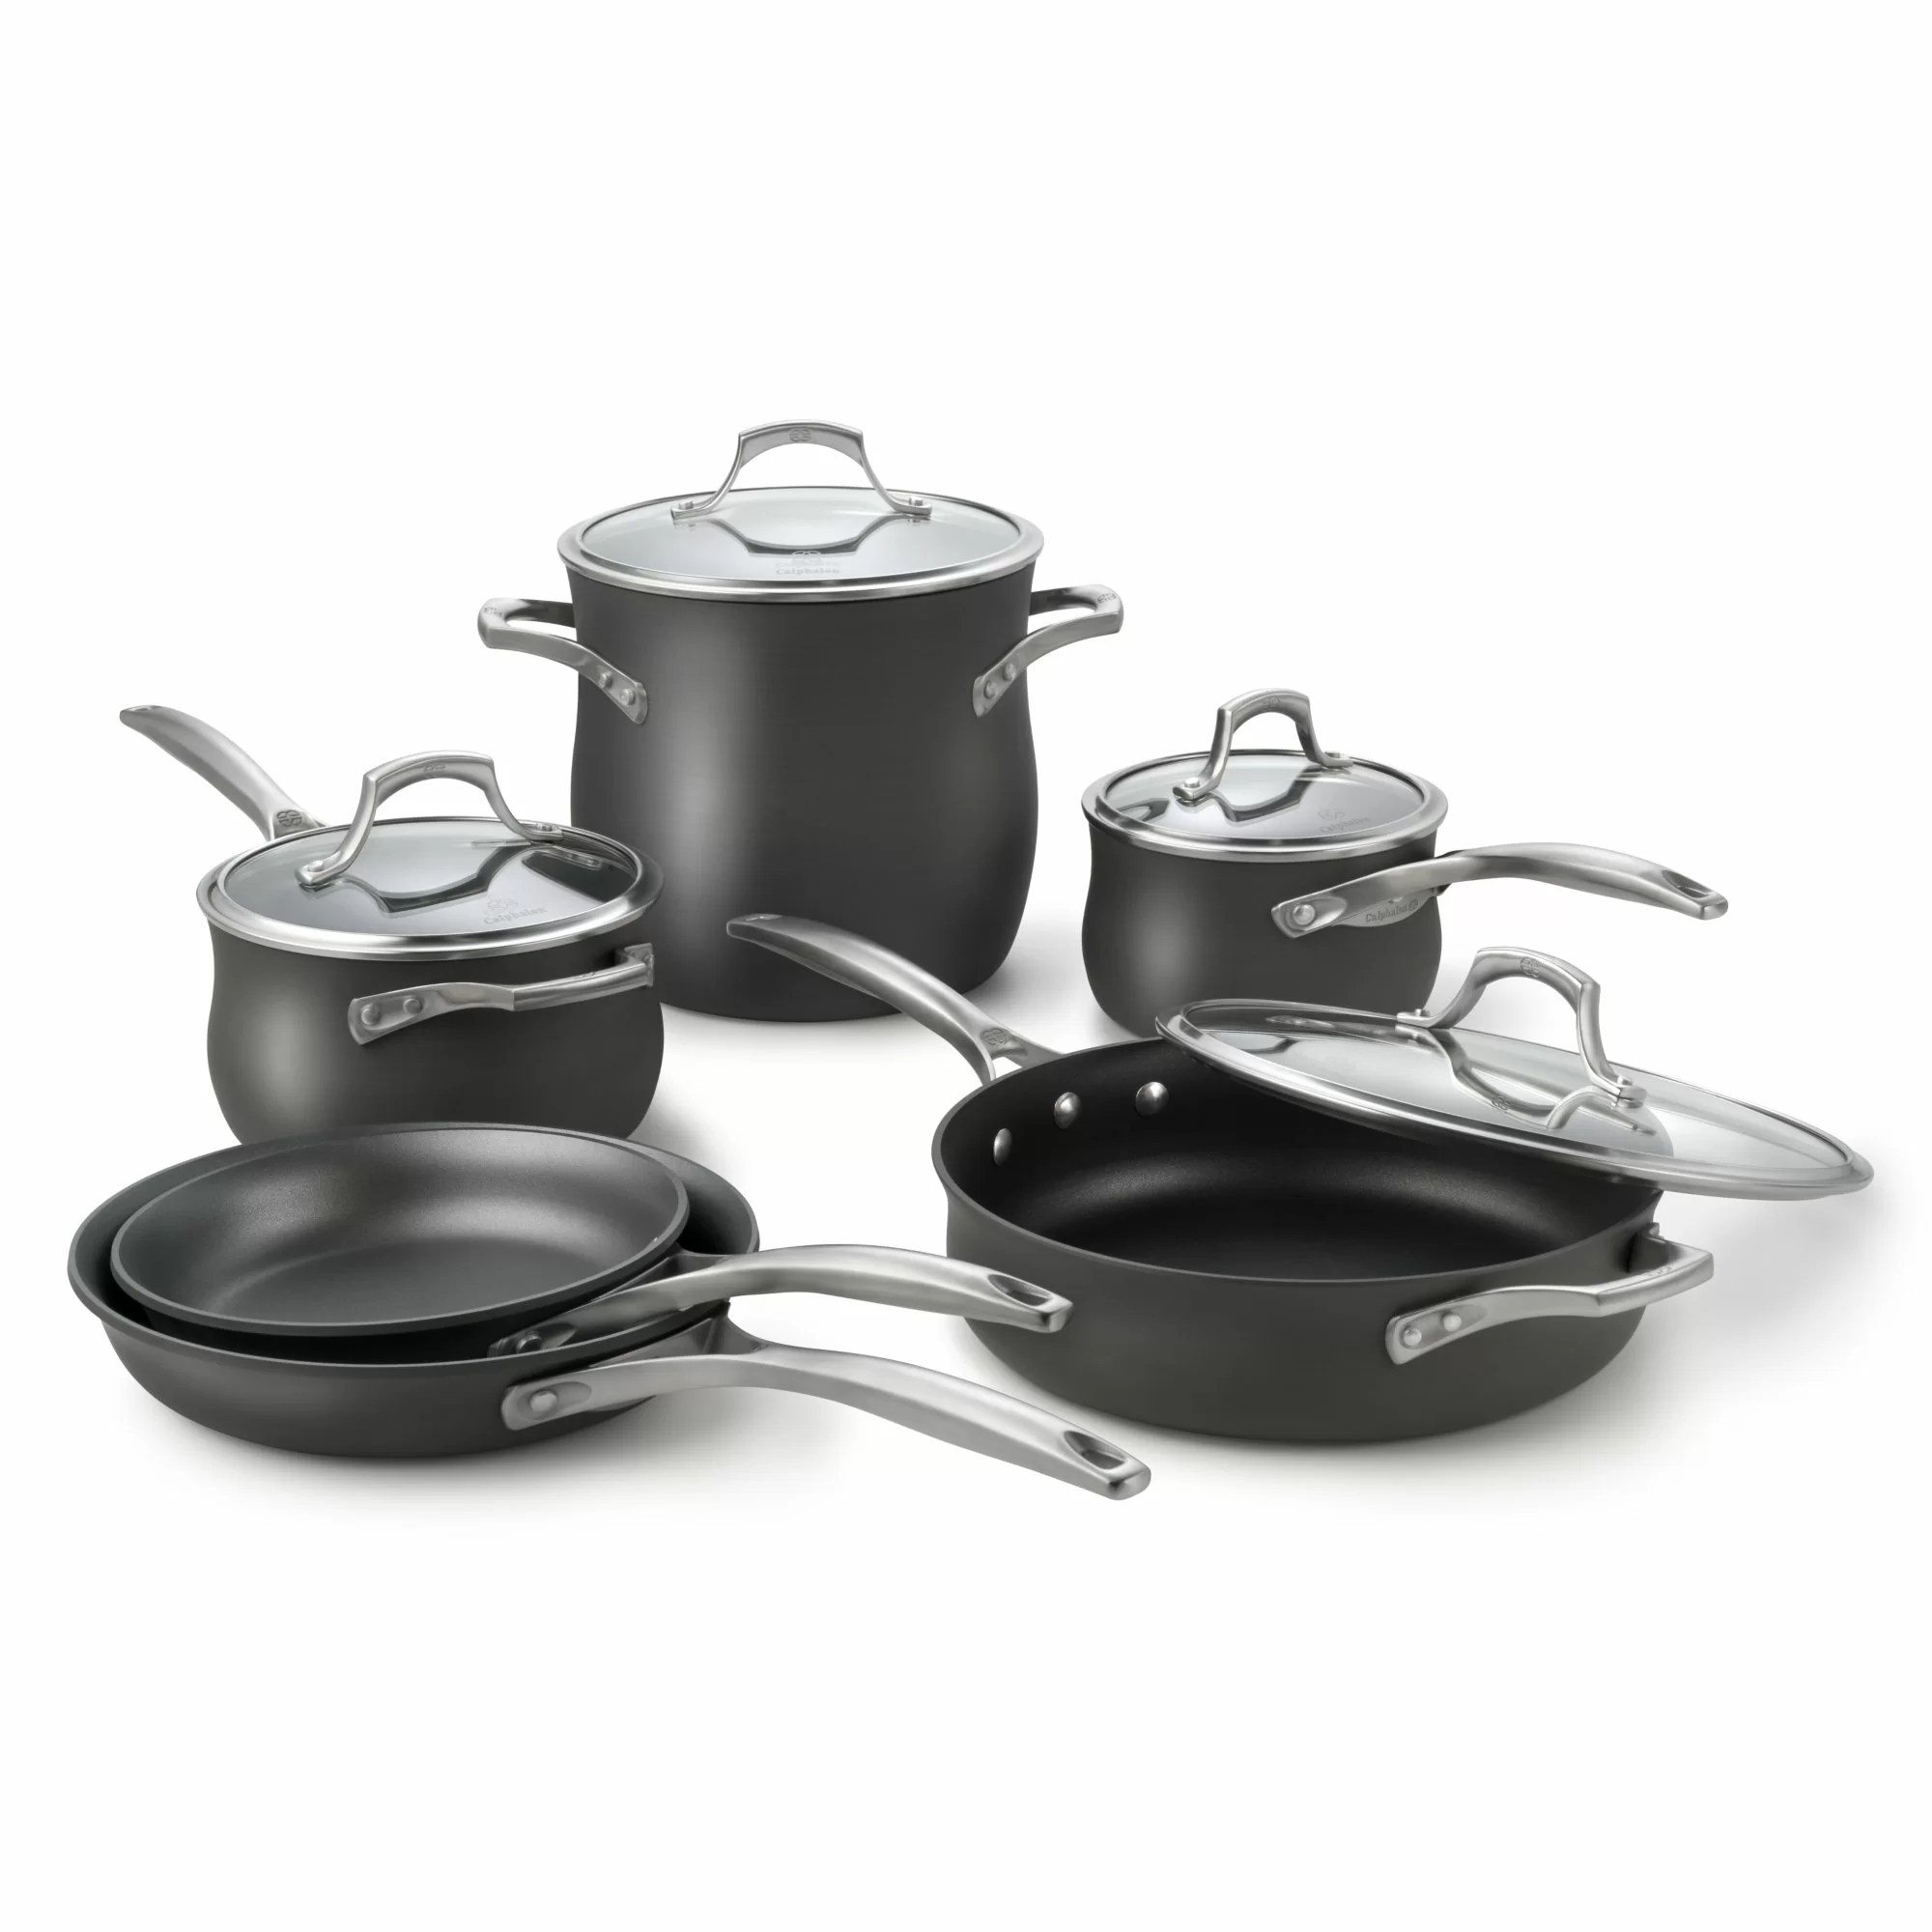 kitchen essentials by calphalon miele unison nonstick 10 piece cookware set and reviews